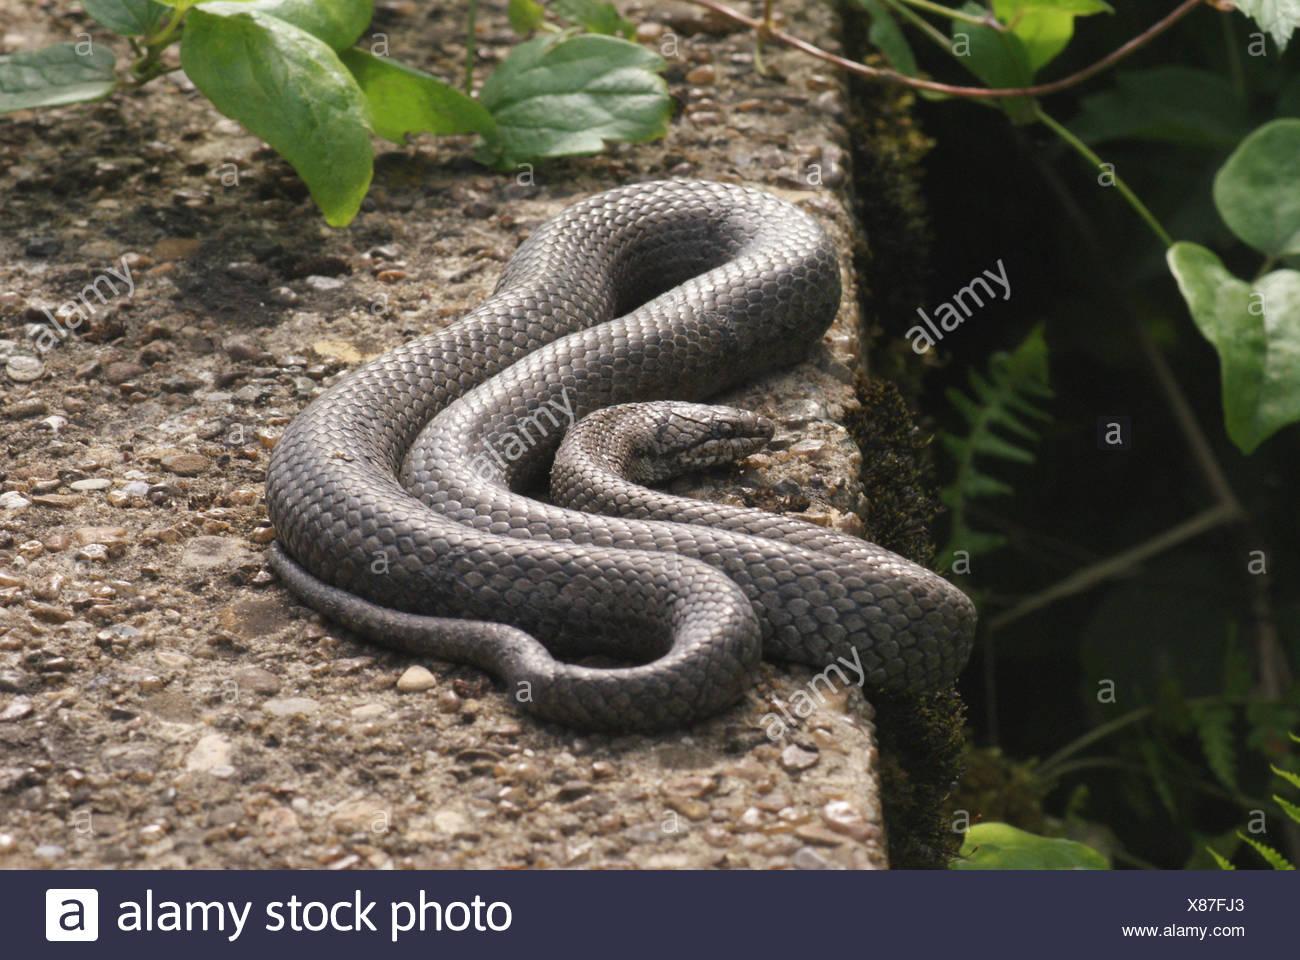 Dice snake - Stock Image